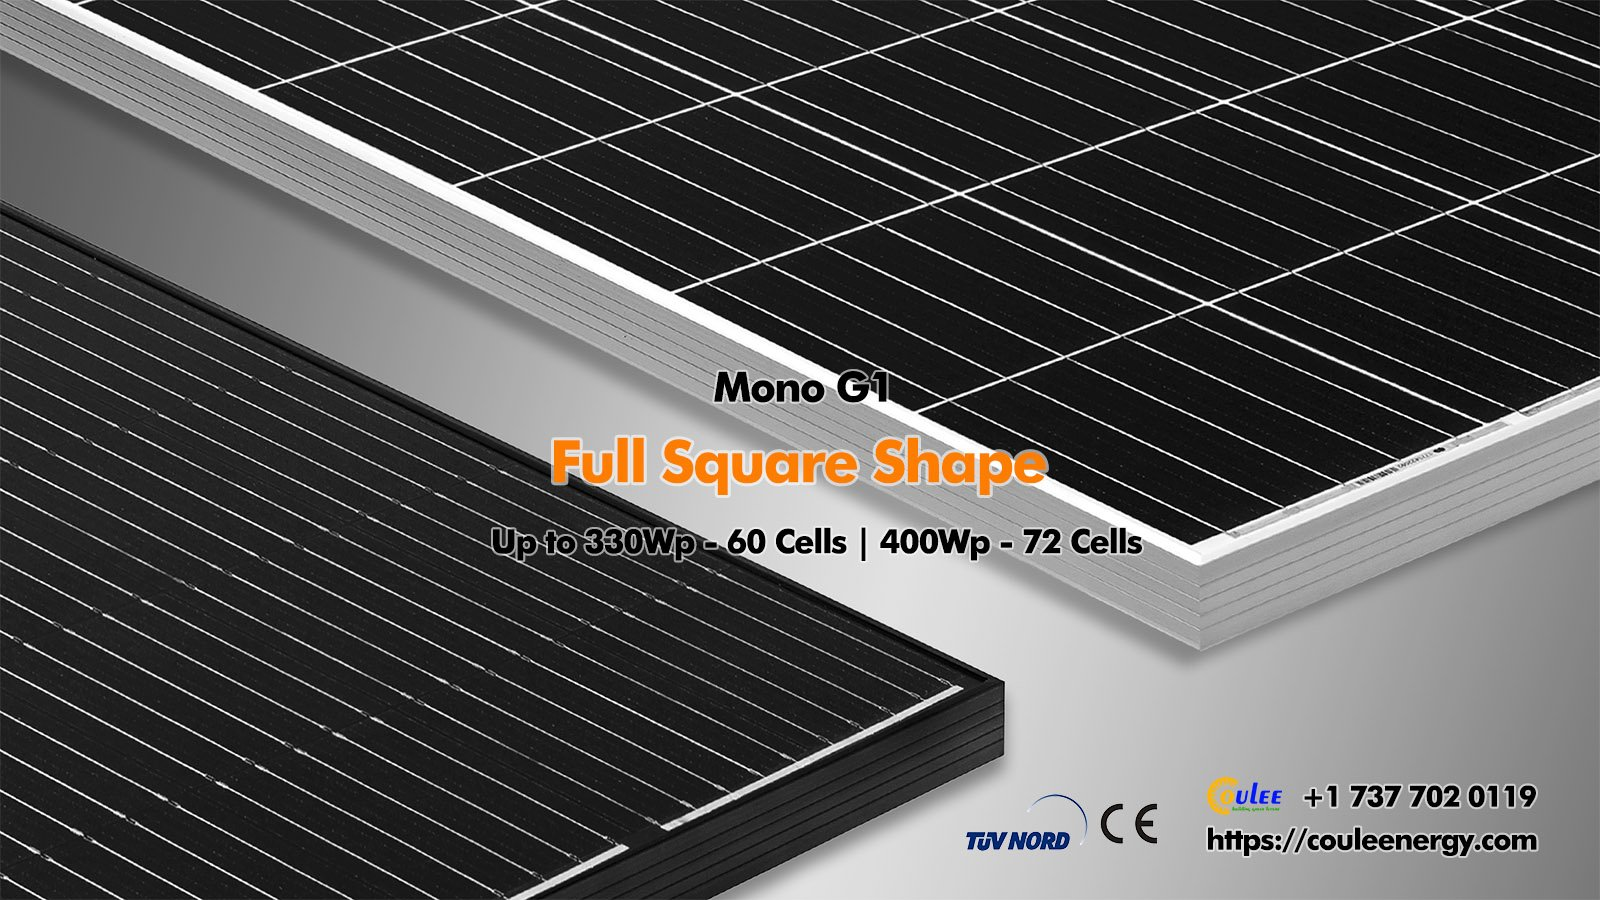 Monocrystalline PV Panels 400Wp